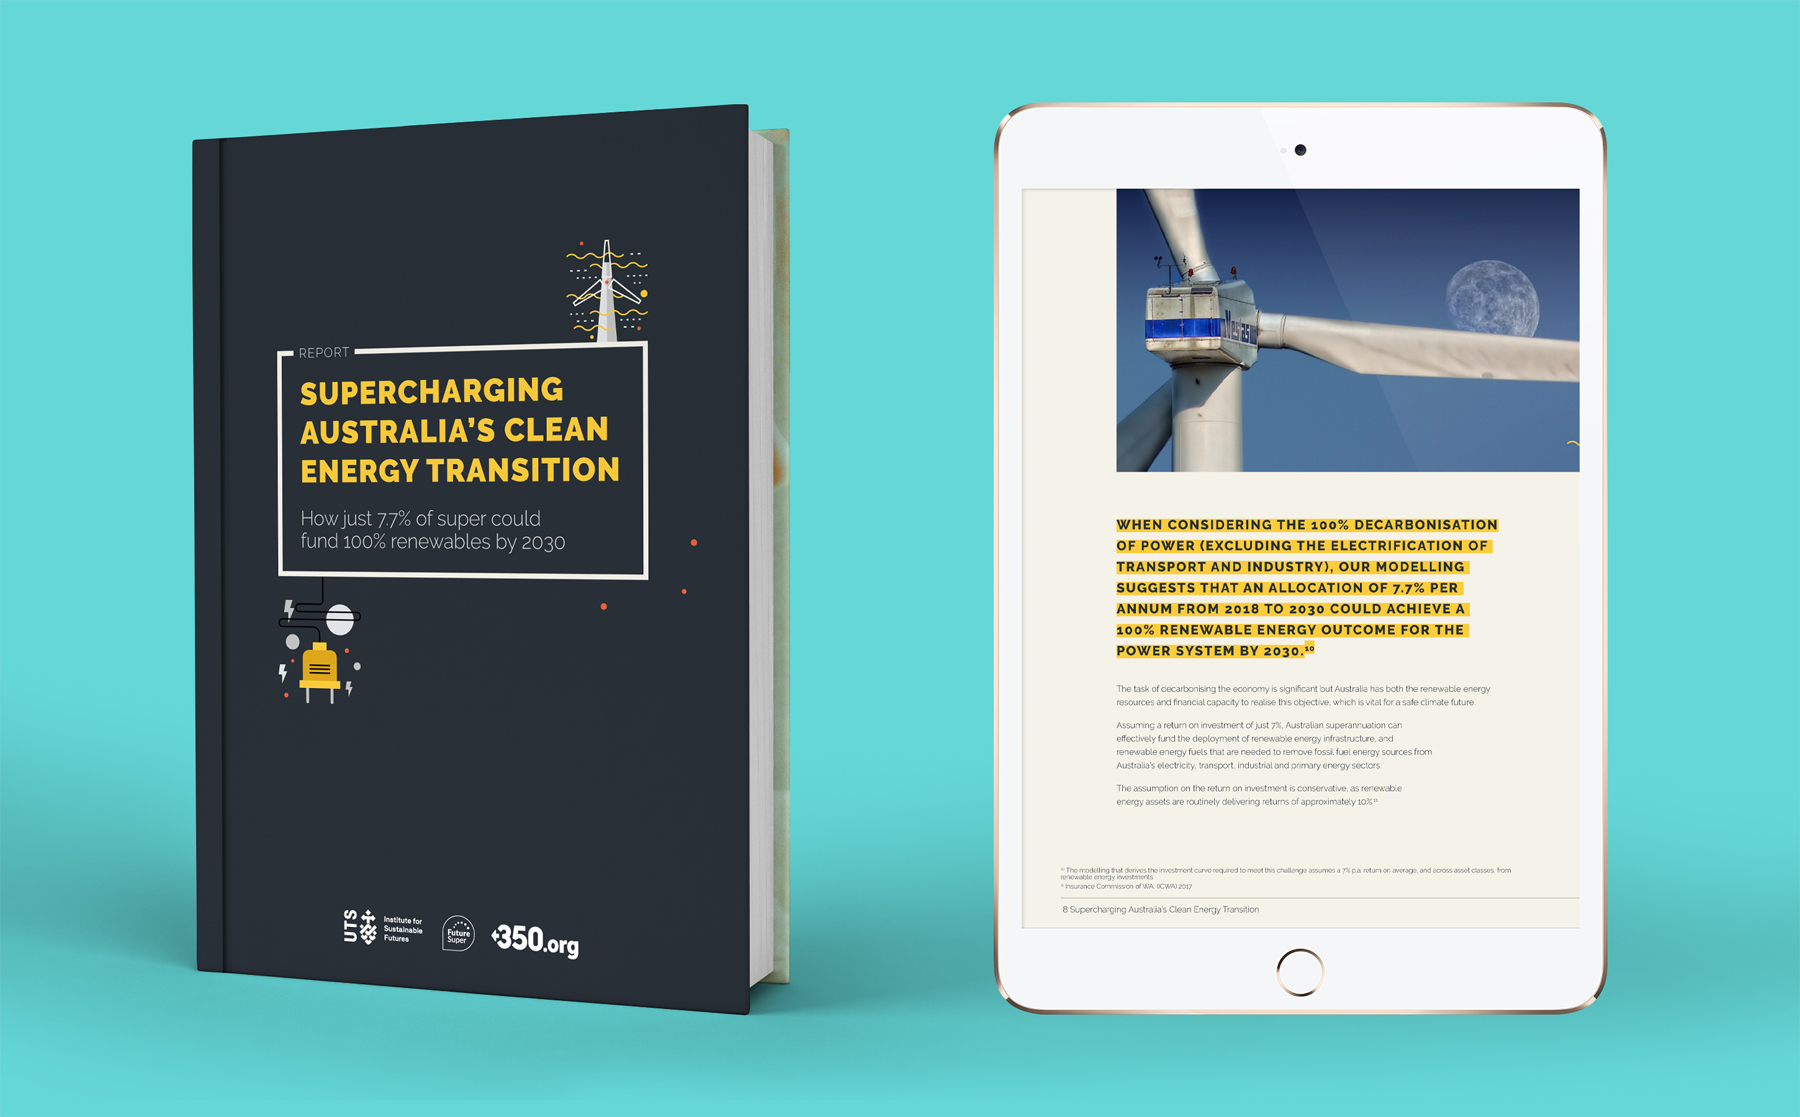 UTS Report: Supercharging Australia's clean energy transition